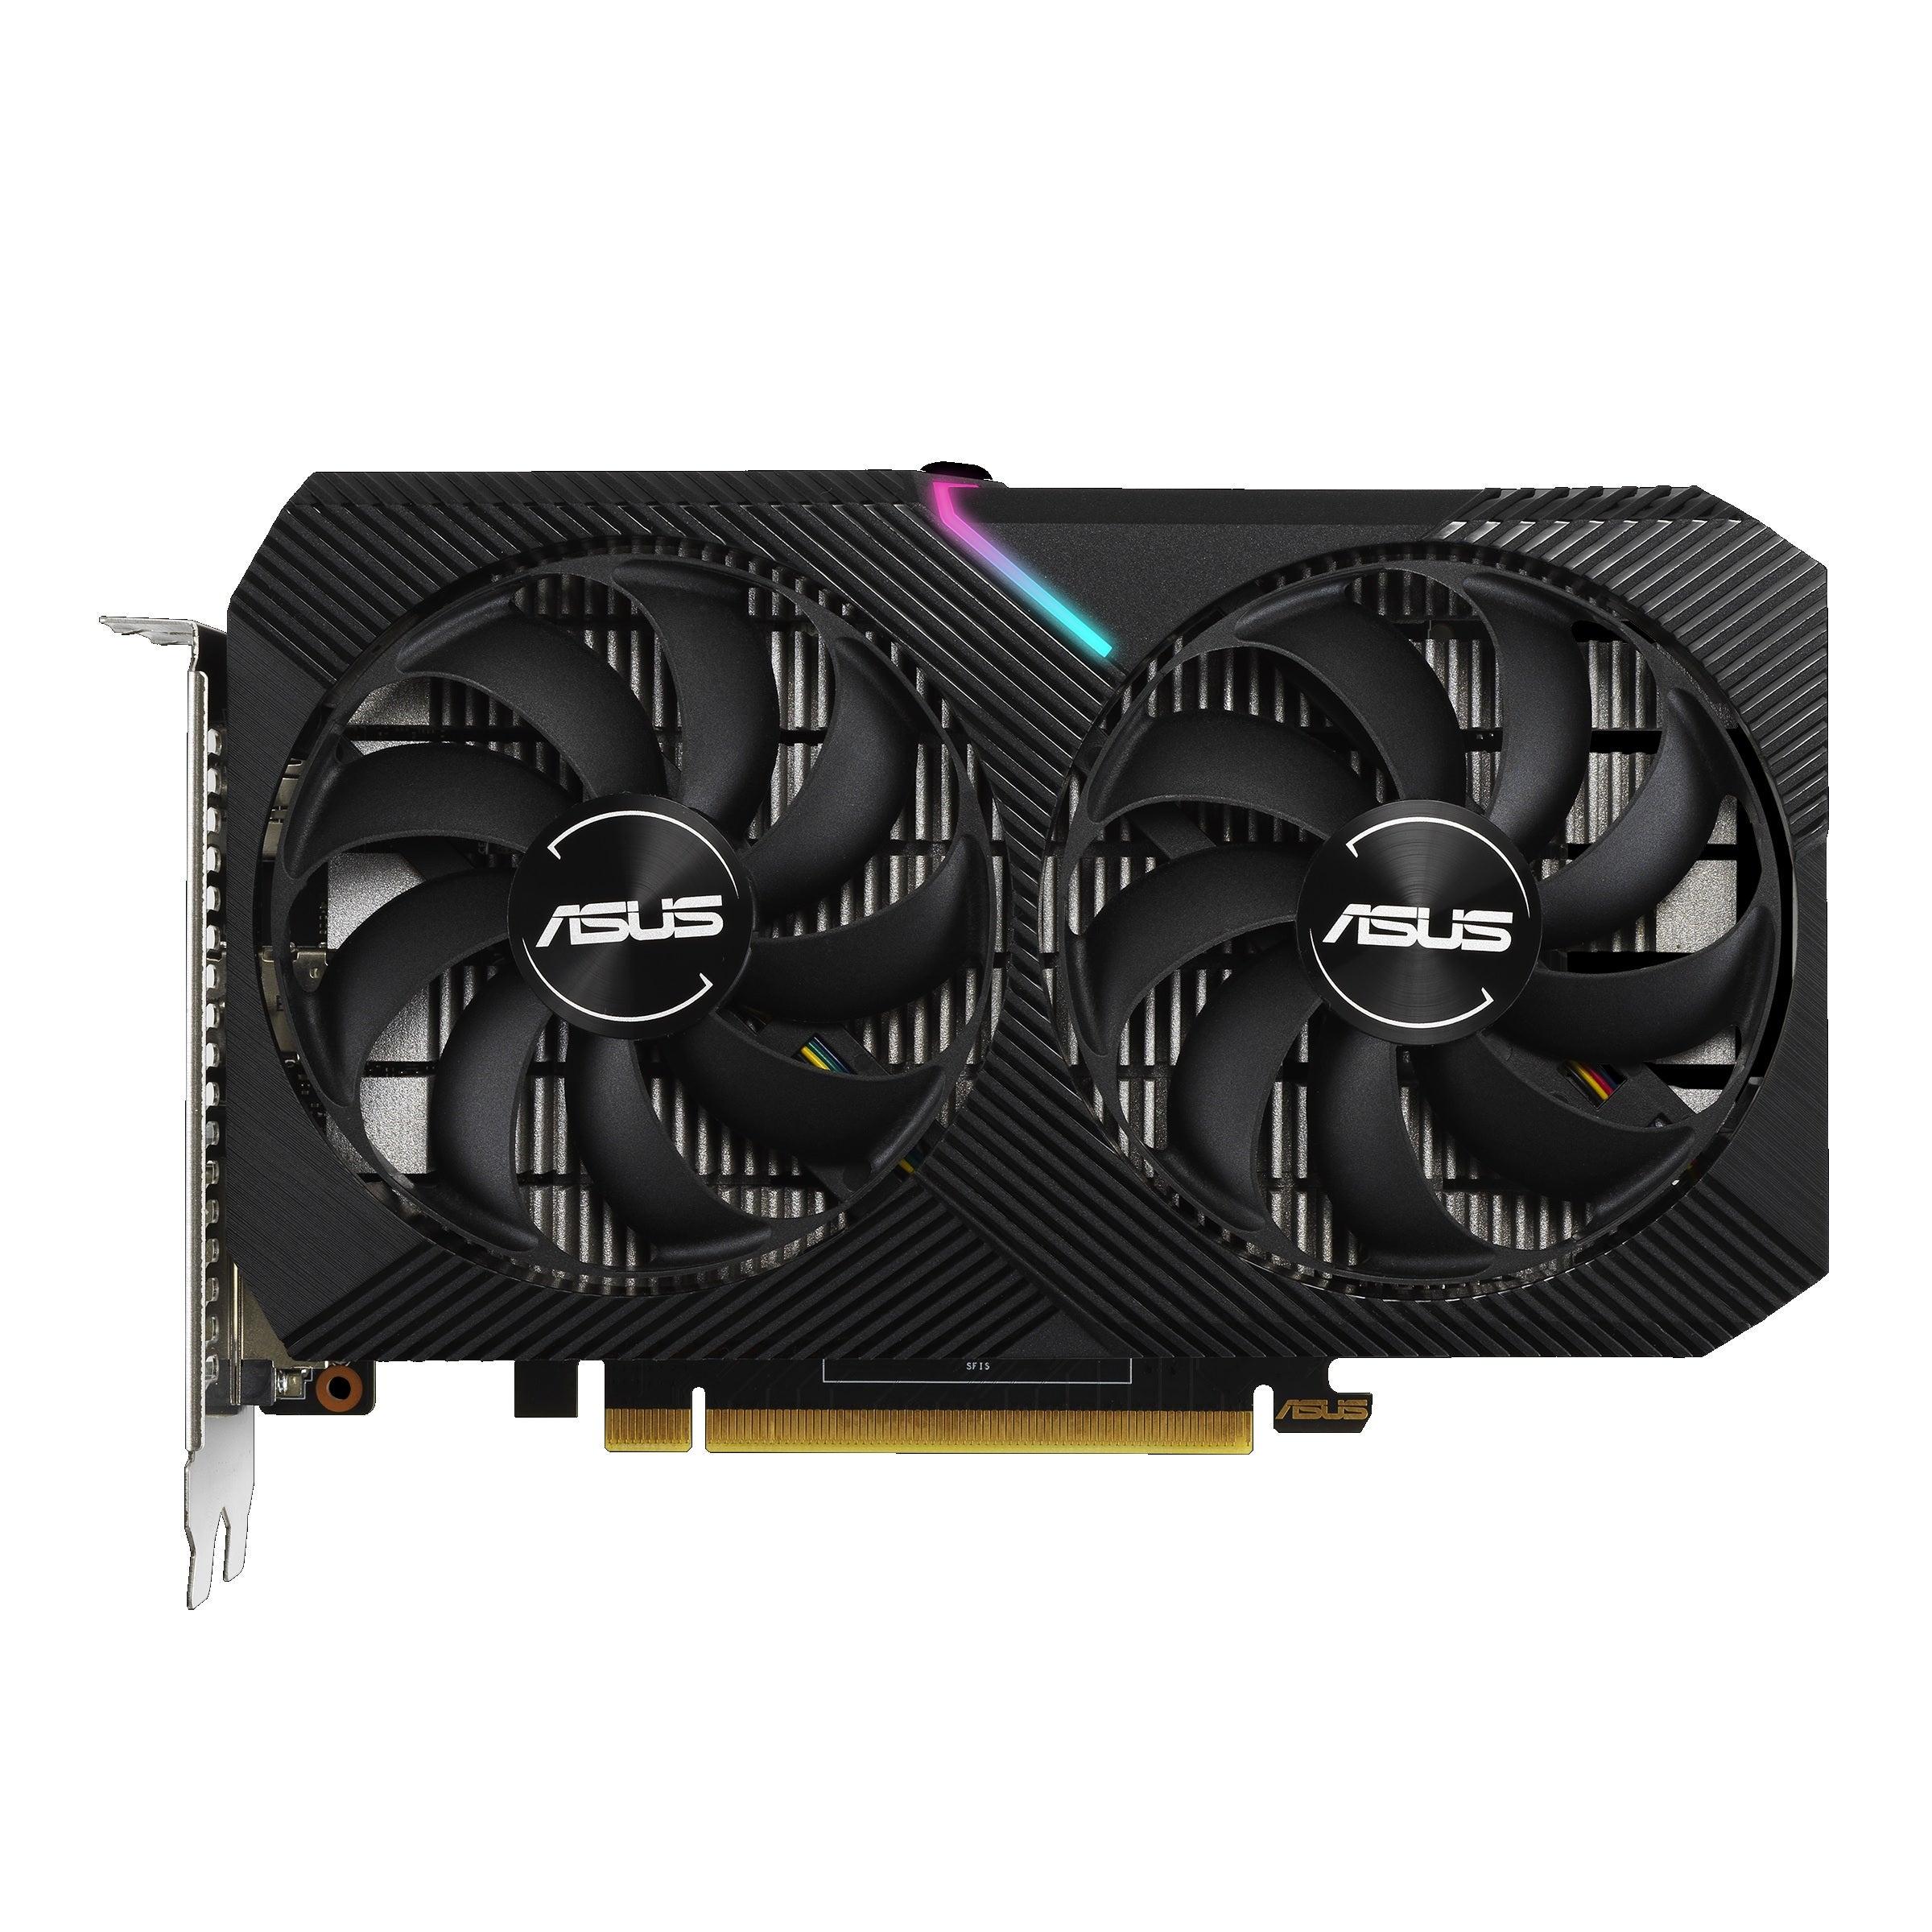 Asus Dual GeForce GTX 1650 Mini OC Edition Graphics Card